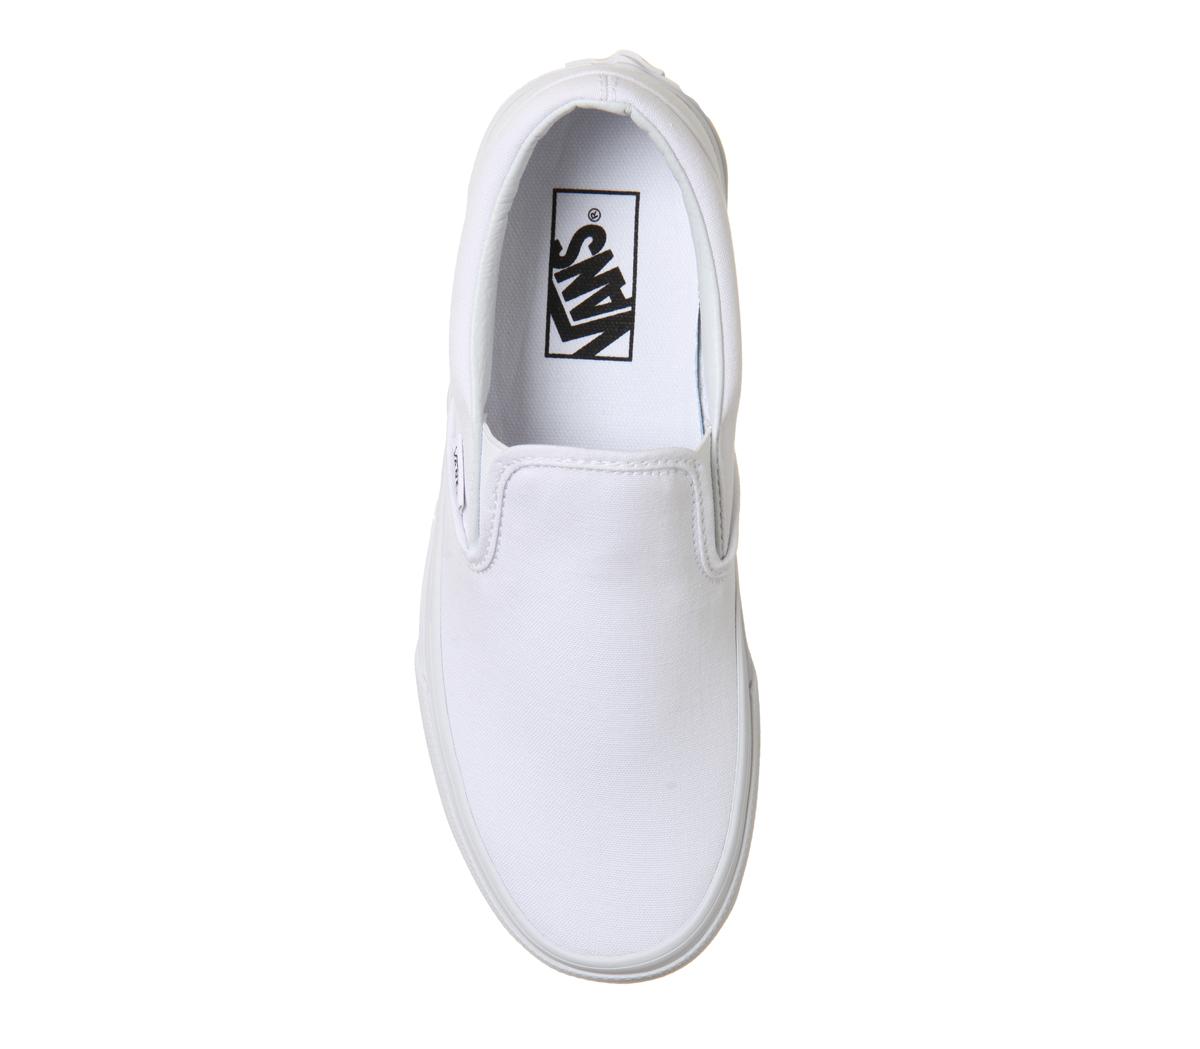 Mens Classic Vans Classic Mens Slip On Trainers WHITE MONO Trainers Shoes 7d225e